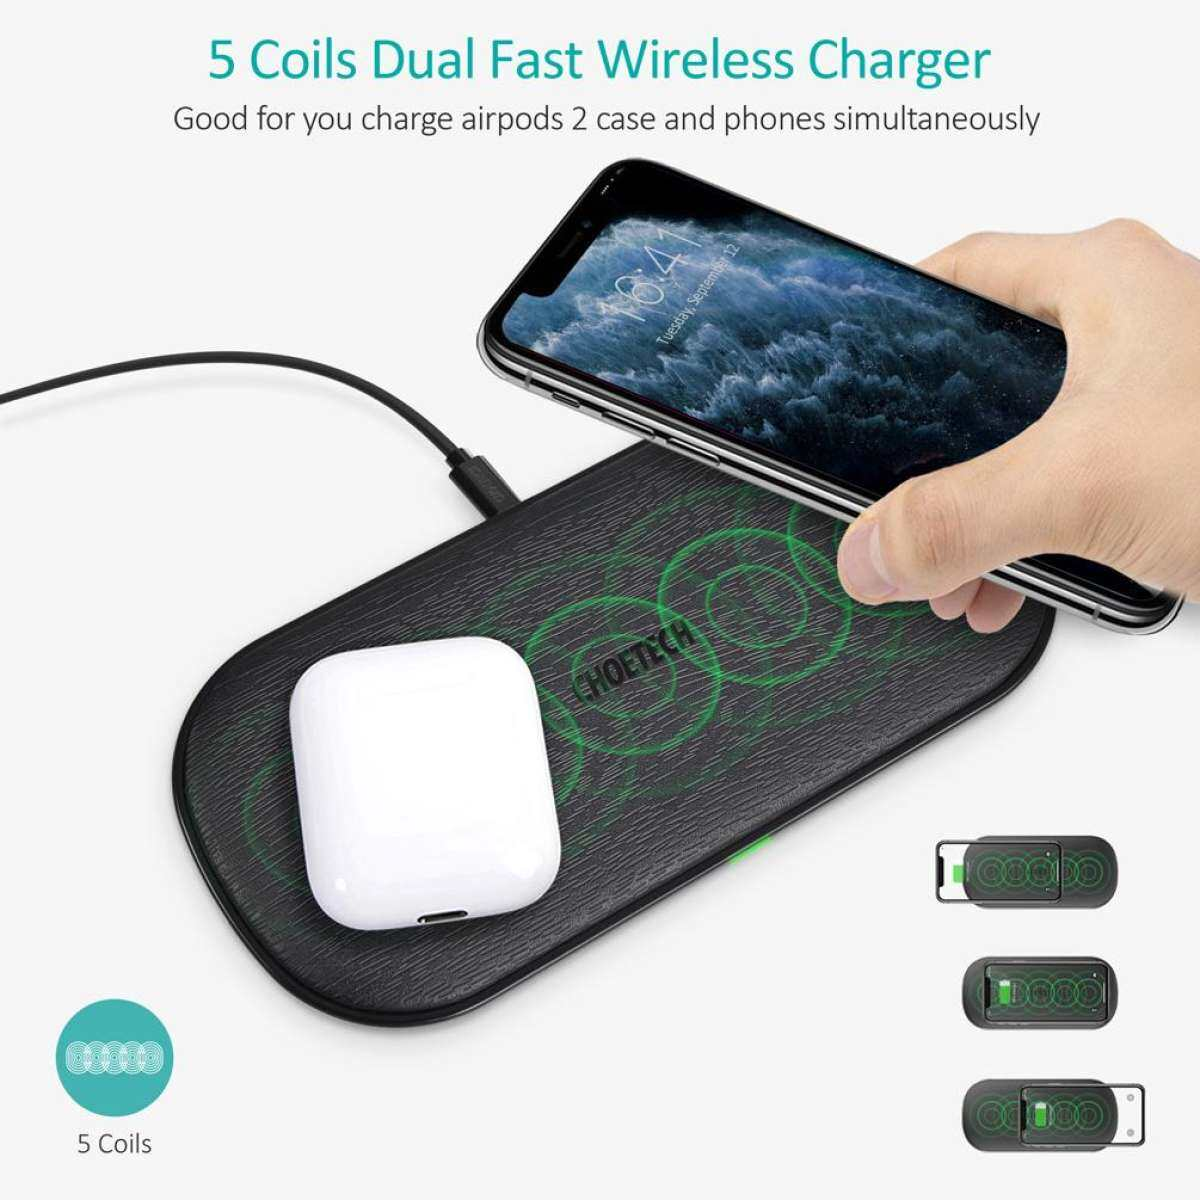 CHOETECH Dual ที่ชาร์จแบบไร้สาย, 5 Coils Qi Certified Fast แท่นชาร์จแบตเตอรี่แบบไร้สายใช้งานร่วมกับ iPhone 11/11 PRO MAX/X/XS/XS MAX, samsung Galaxy Note 10/หมายเหตุ 10 +/S10/S10 +,AirPods Pro